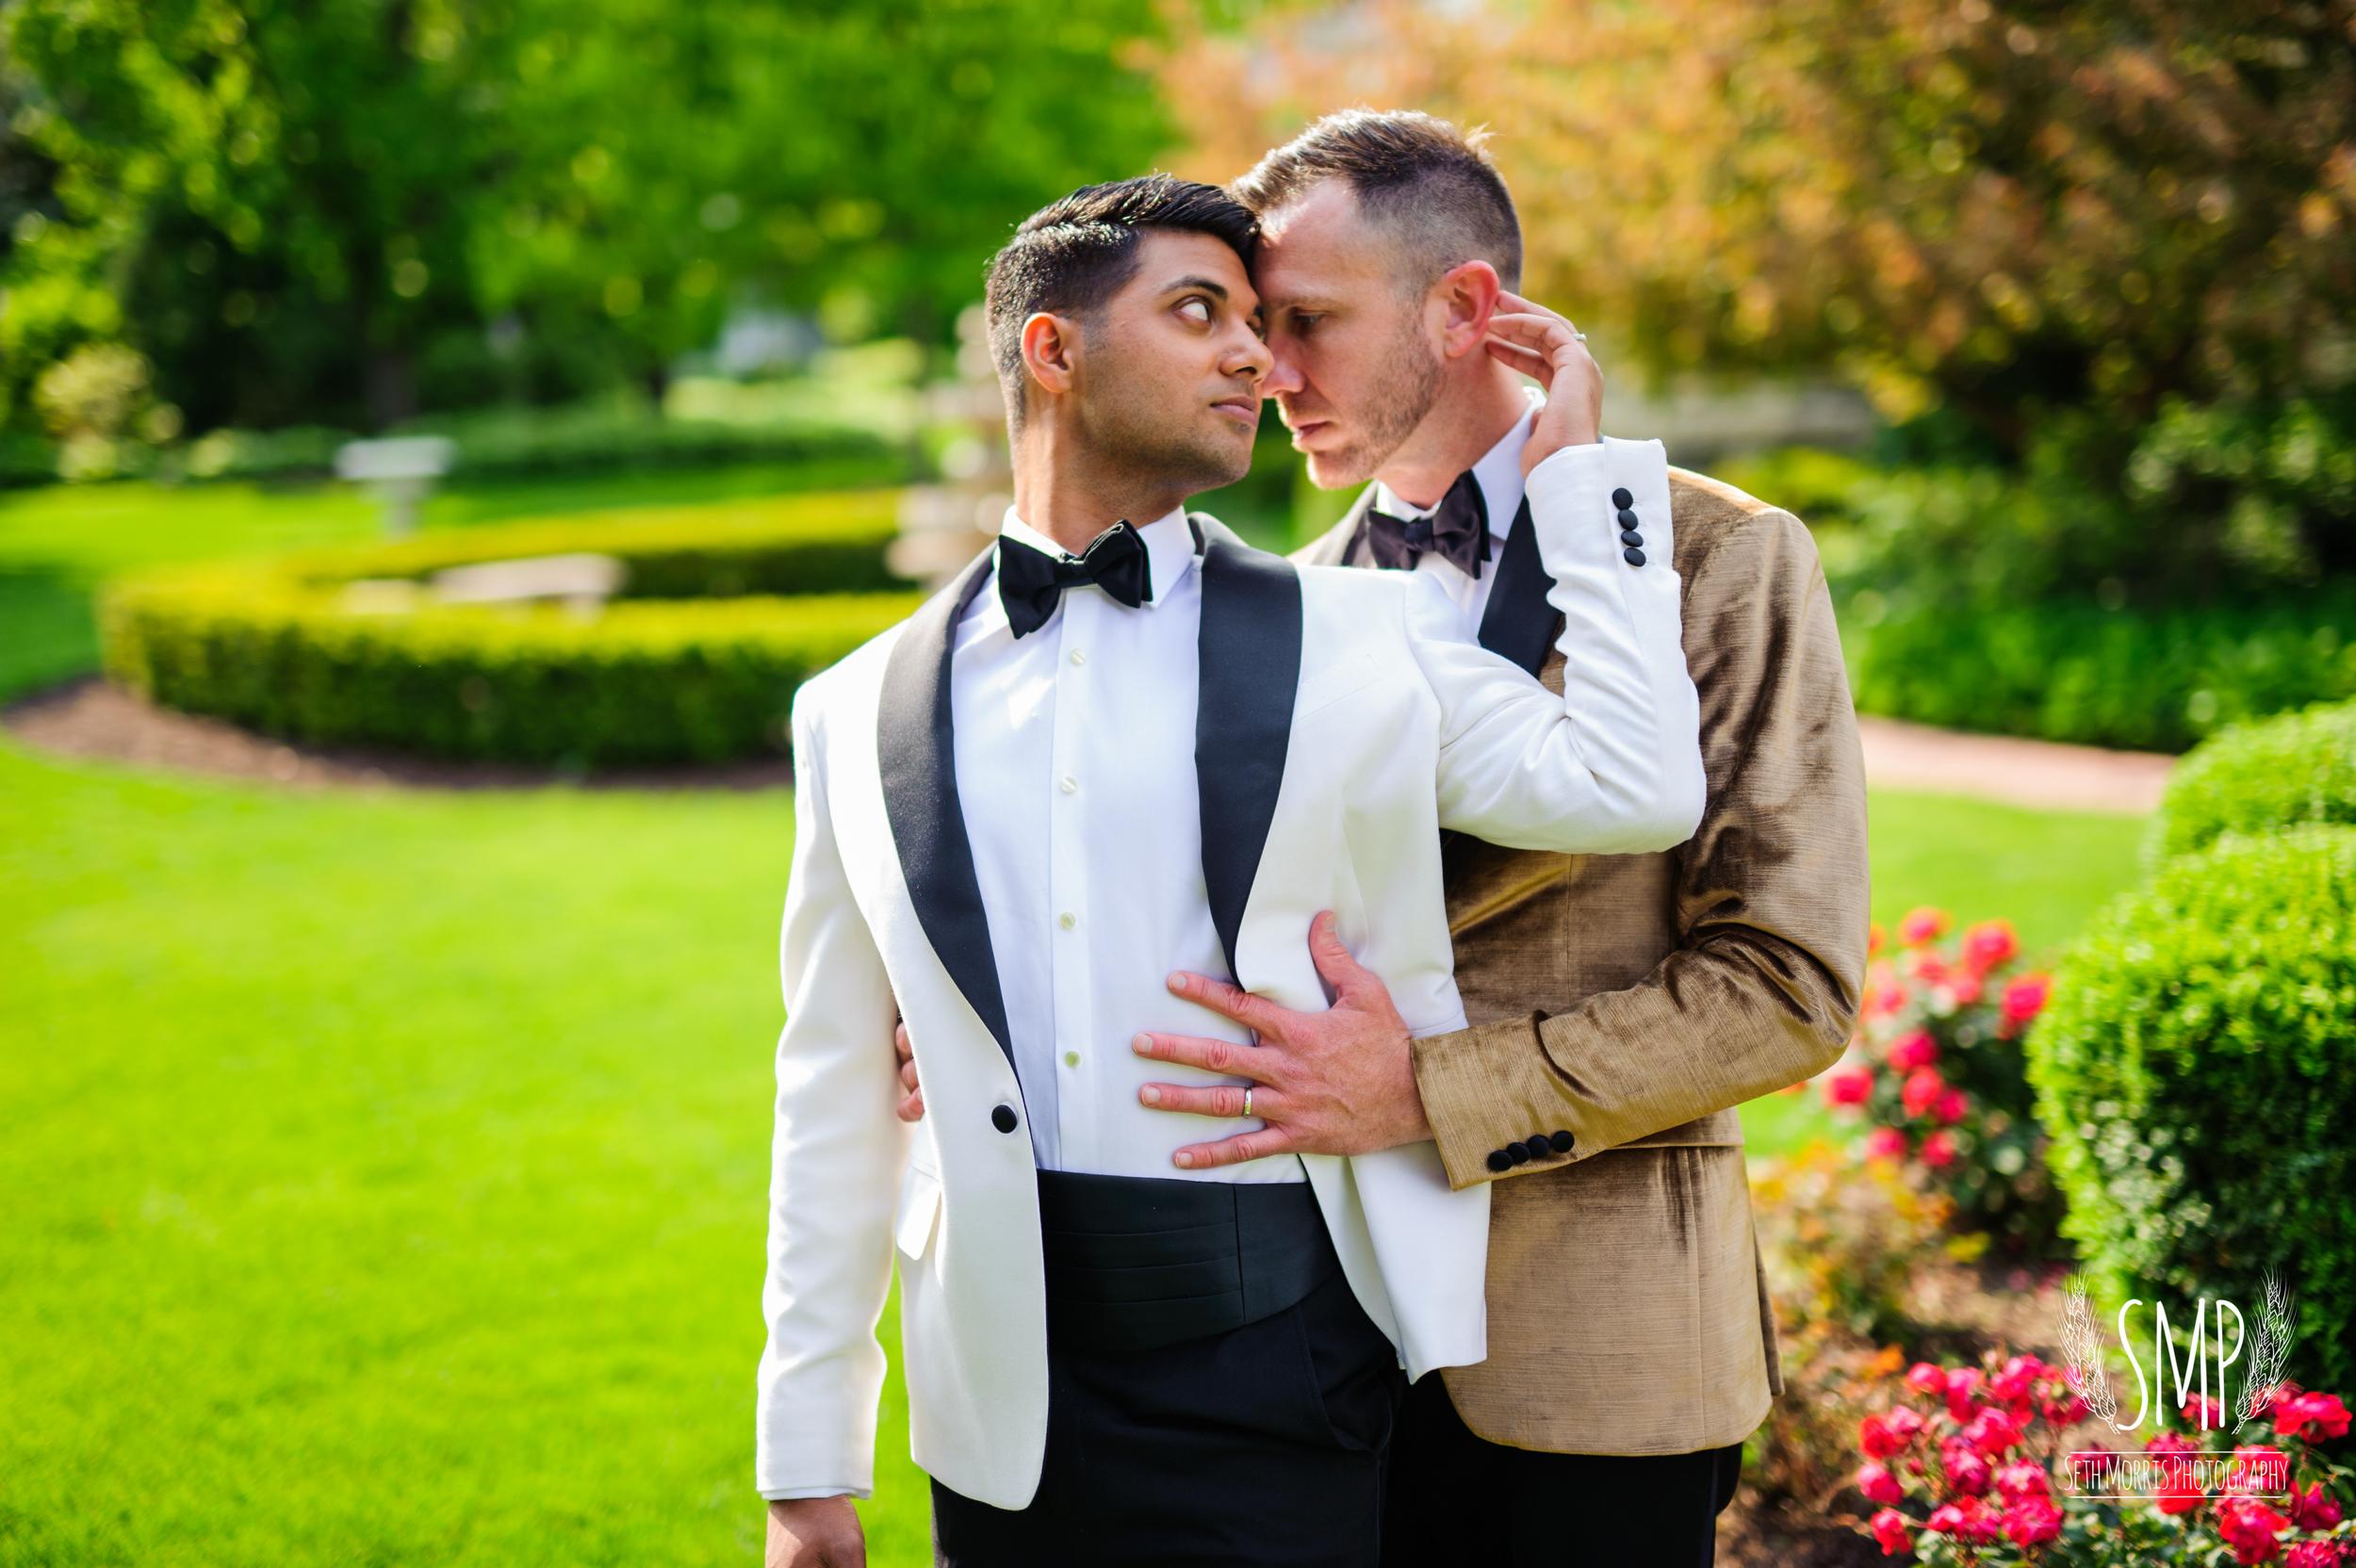 same-sex-wedding-photographer-chicago-illinois-46.jpg